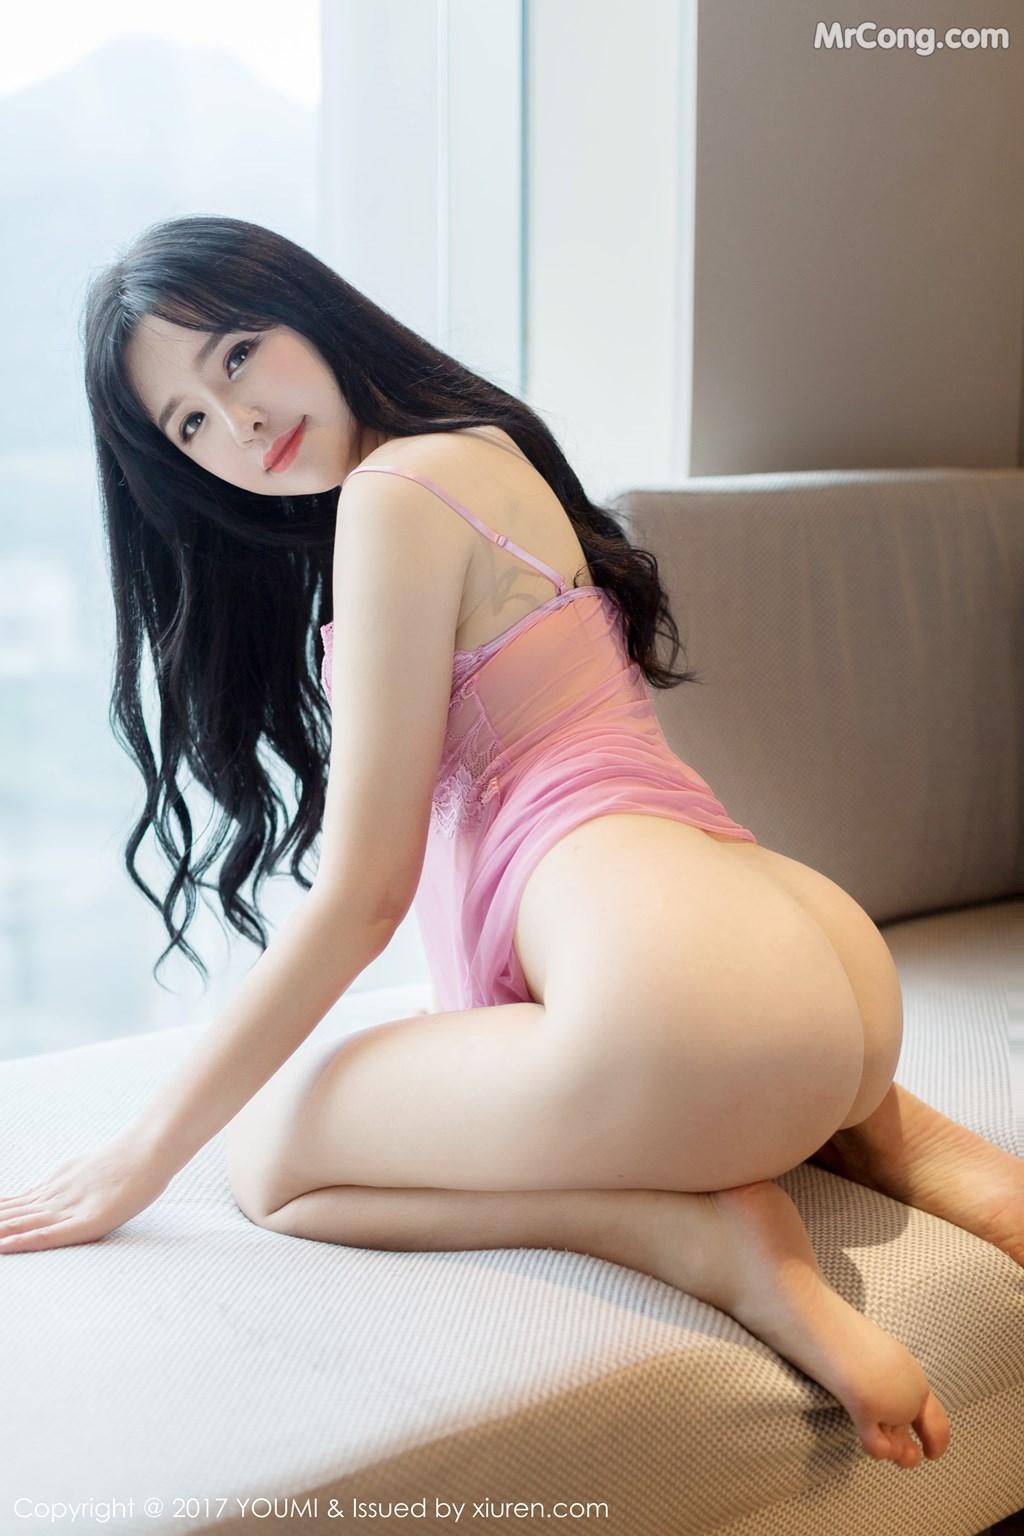 Image YouMi-No.067-Liu-Yu-Er-MrCong.com-004 in post YouMi No.067: Người mẫu Liu Yu Er (刘钰儿) (45 ảnh)